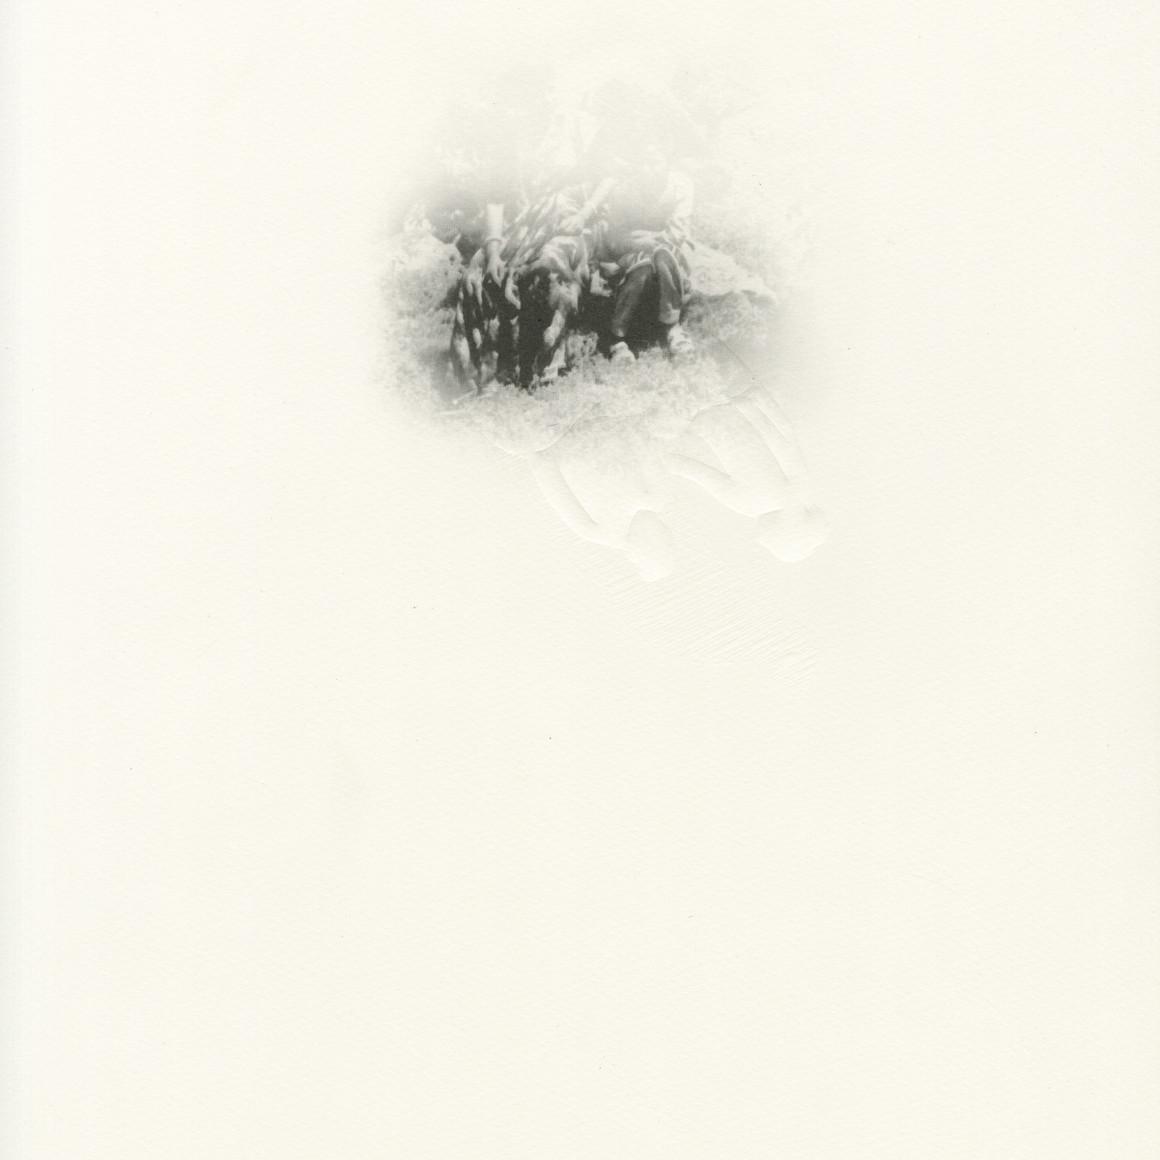 Salama Nasib, Shadow No 3, 2018